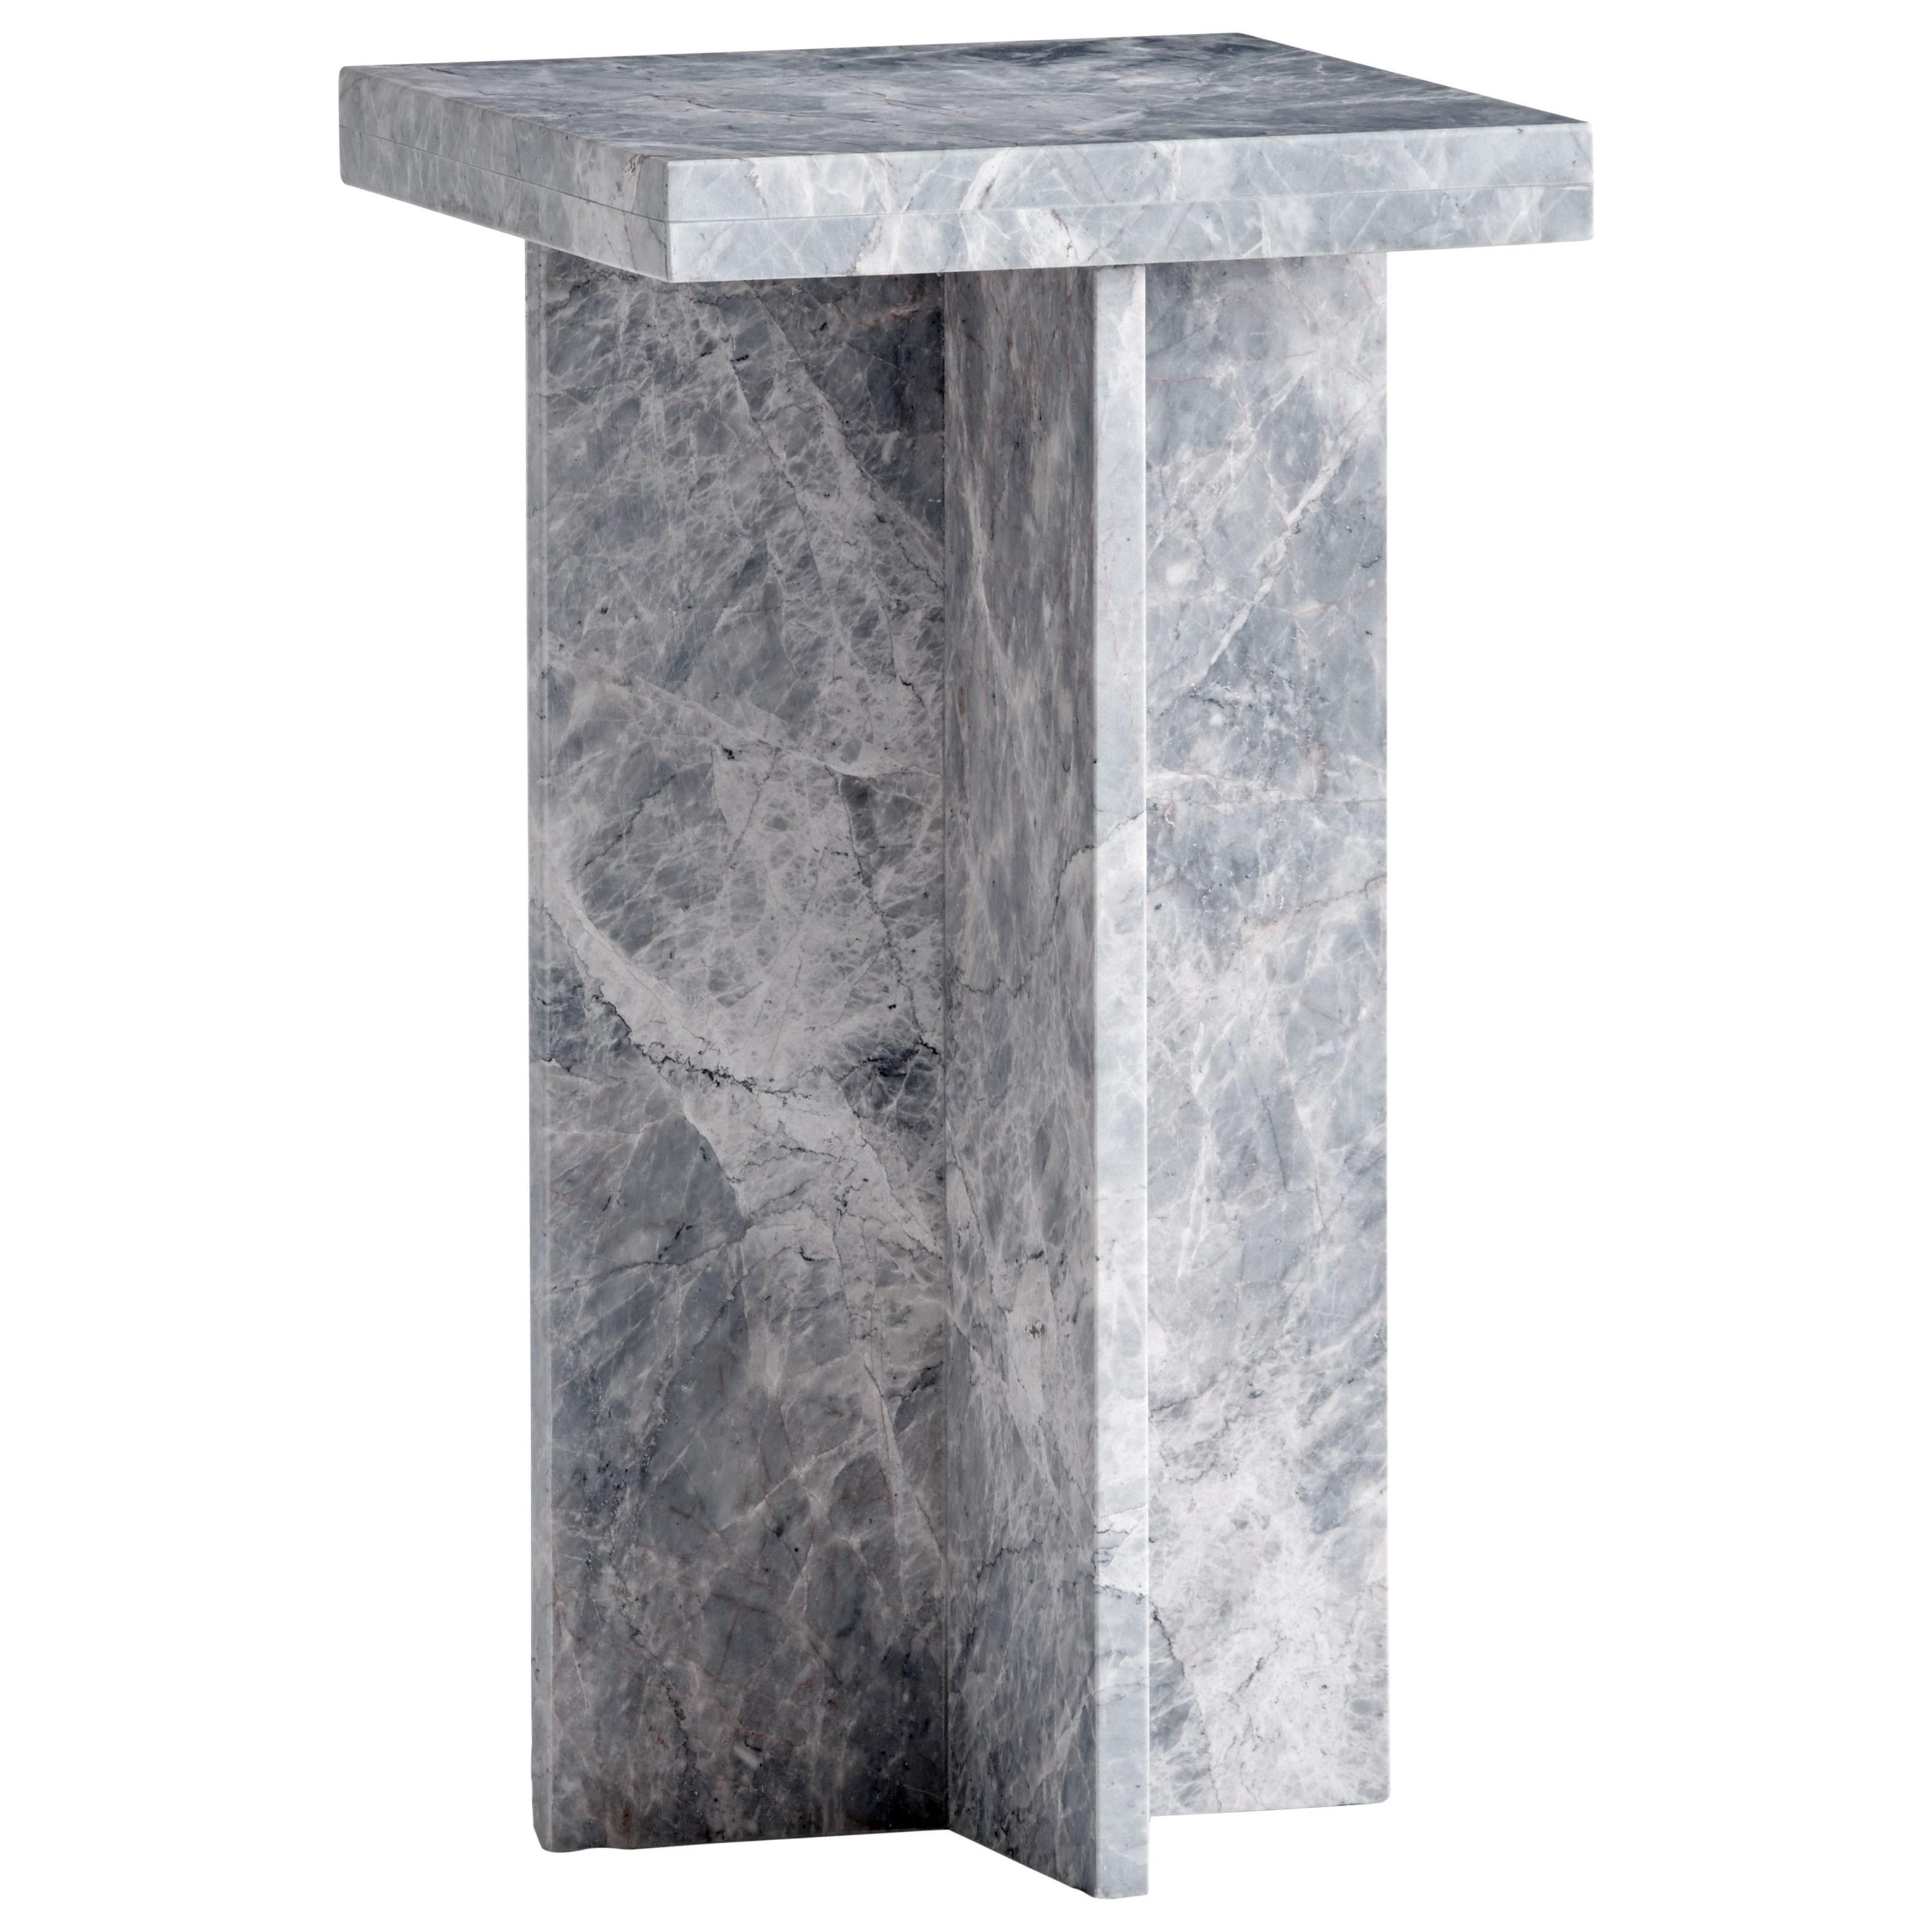 Santana Loft Stone Accent Table by Lexington at Baer's Furniture